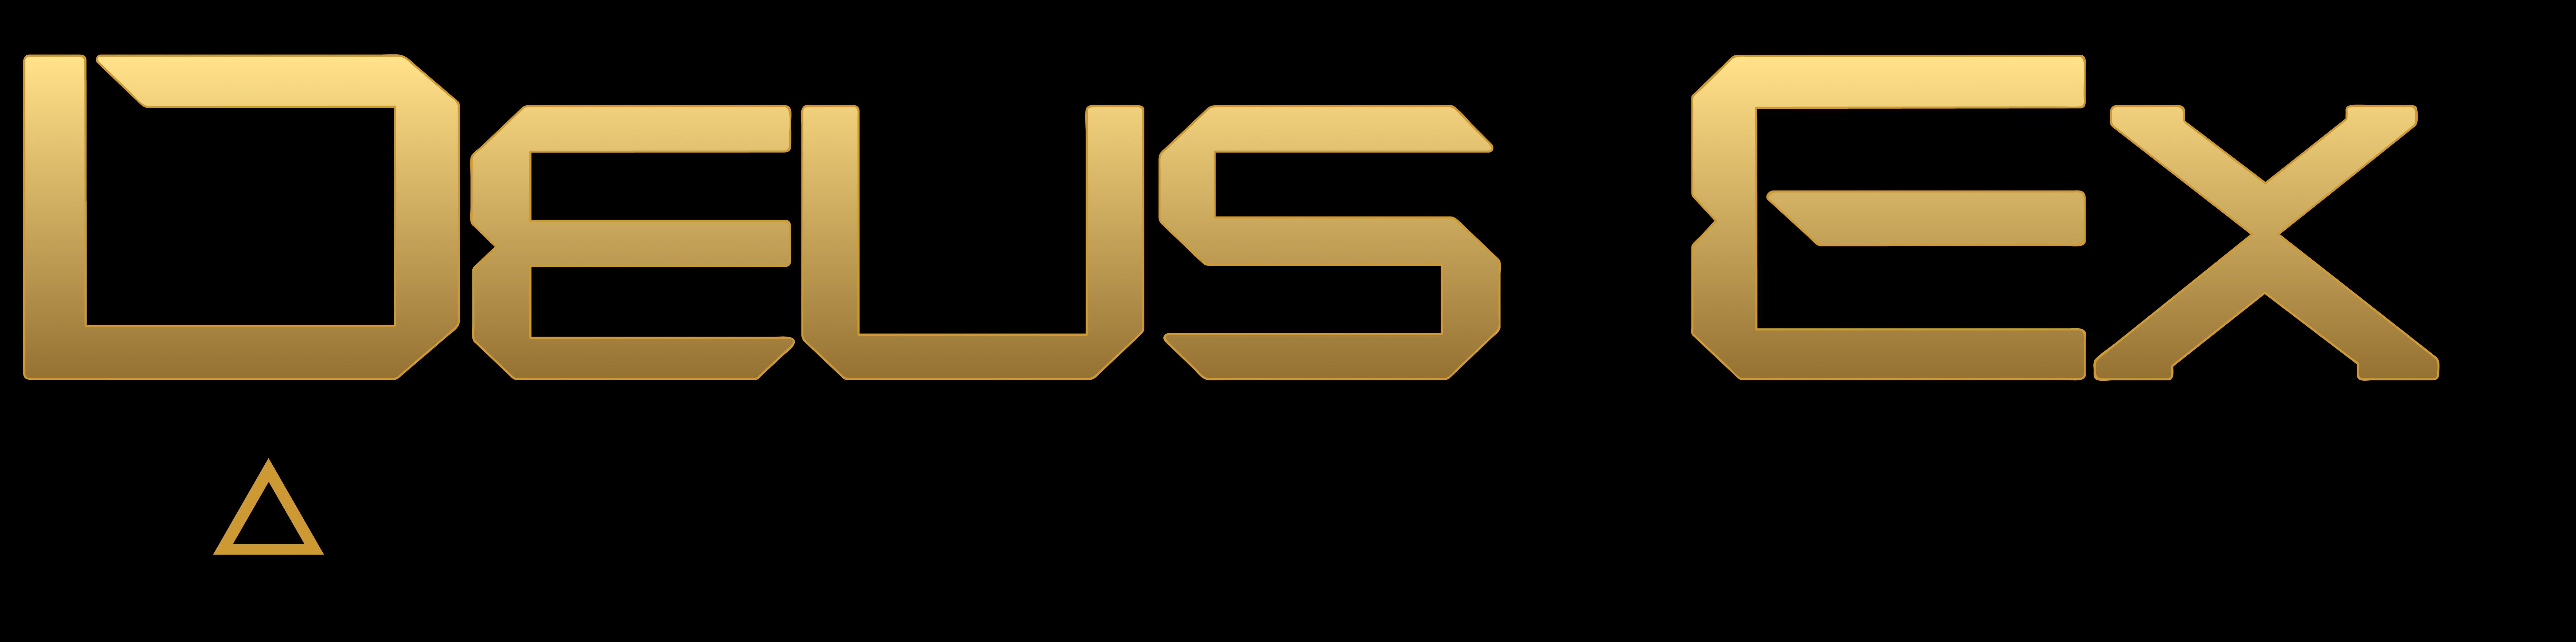 Deus Ex Mankind Divided Logo Png